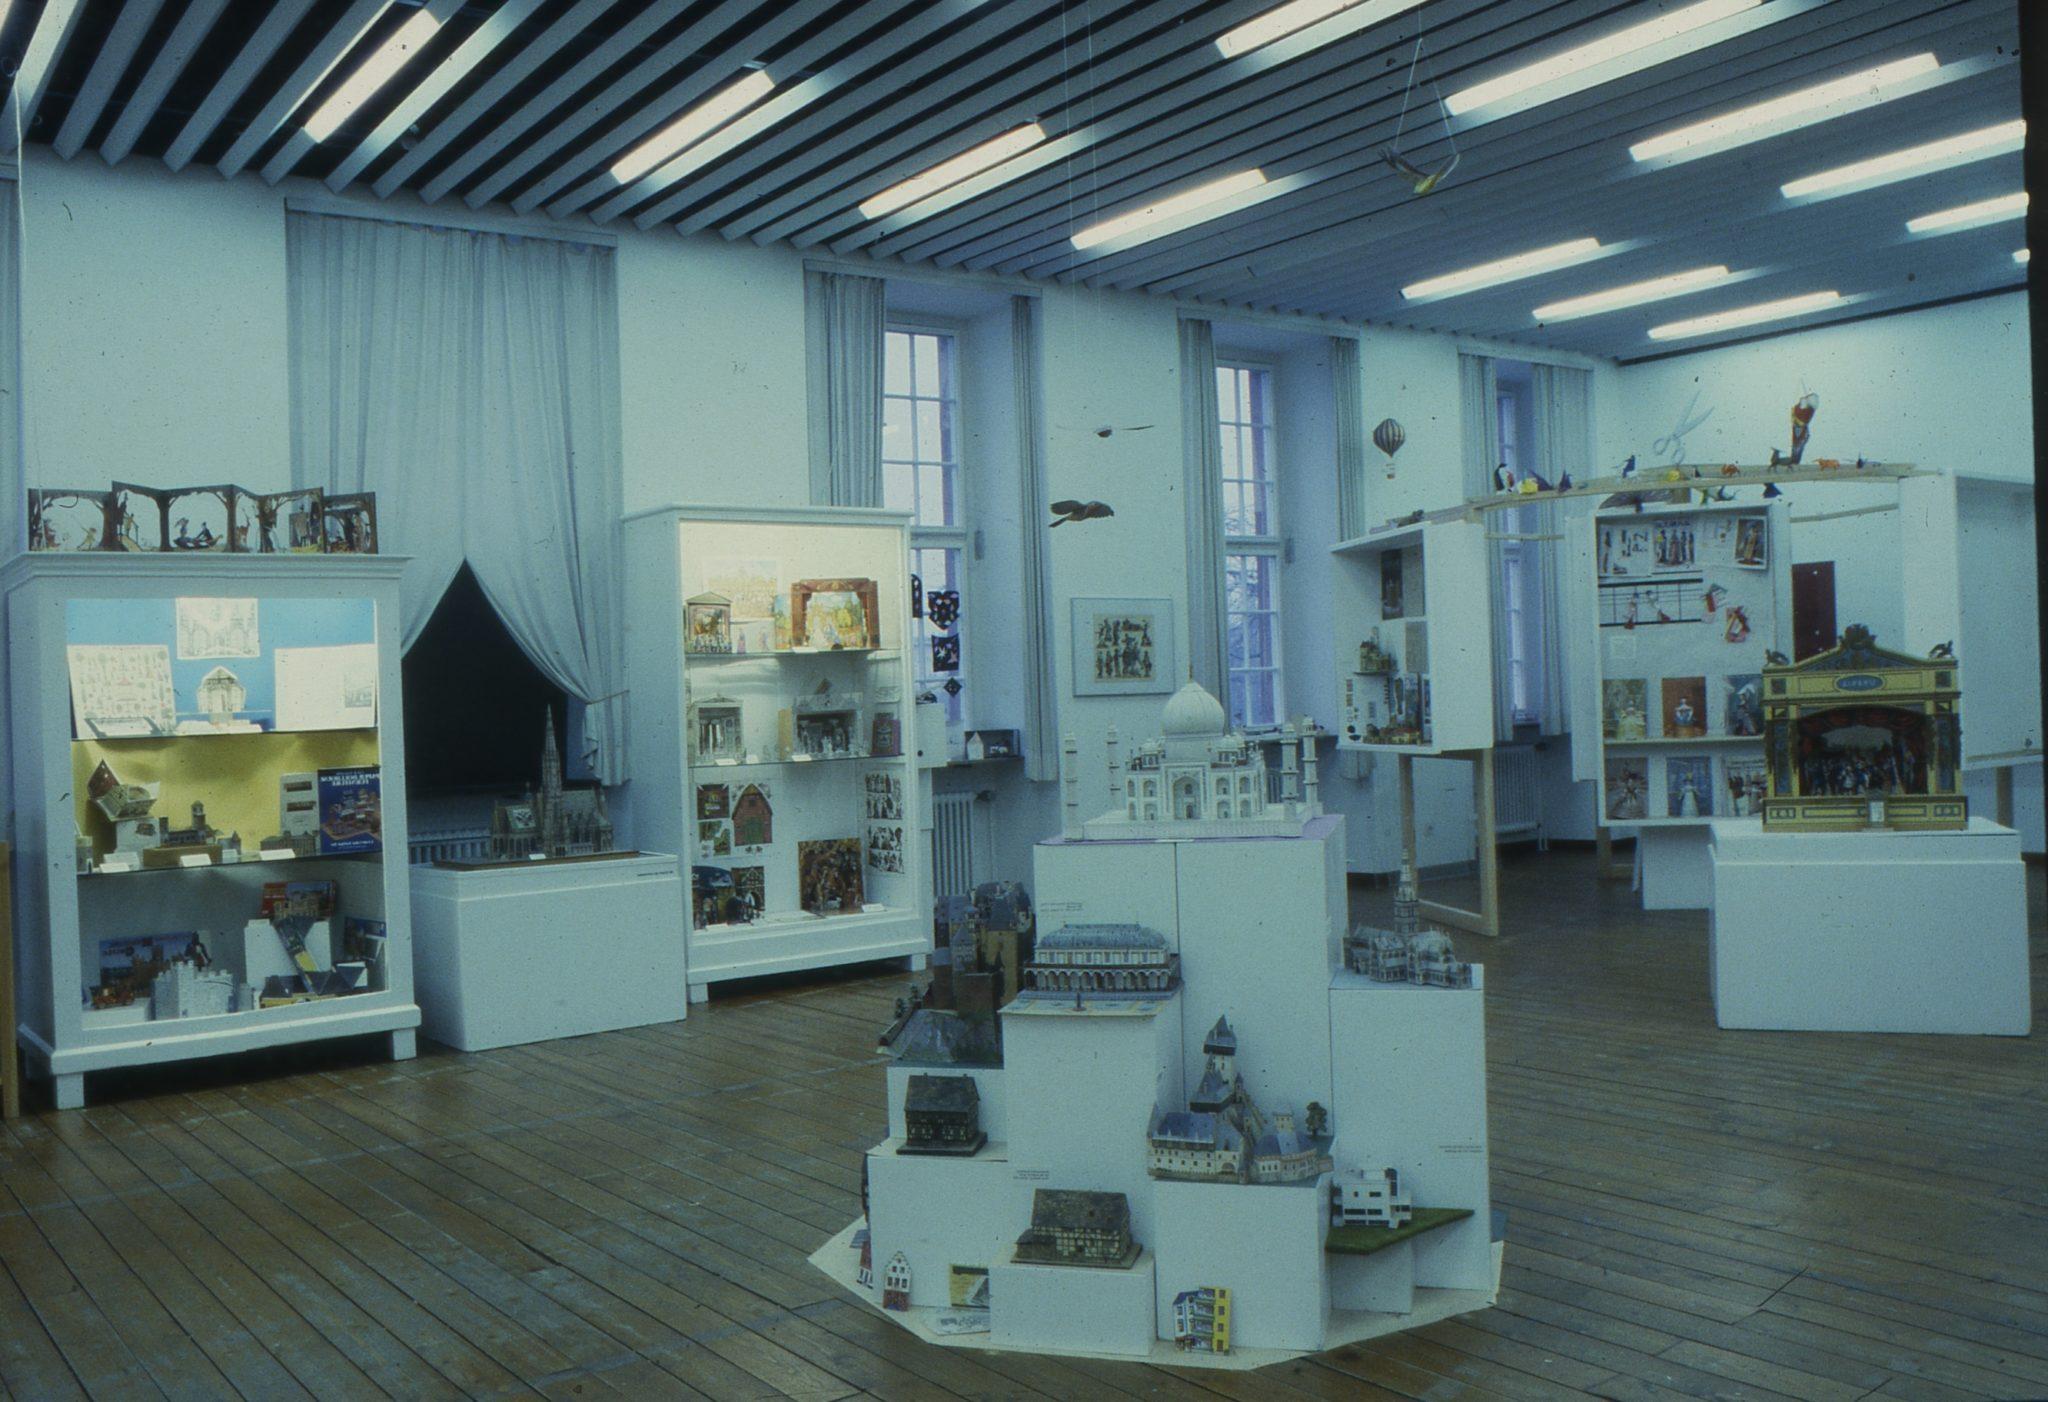 Kindermuseum Frankfurt - Kleine Welt aus Papier (1987)